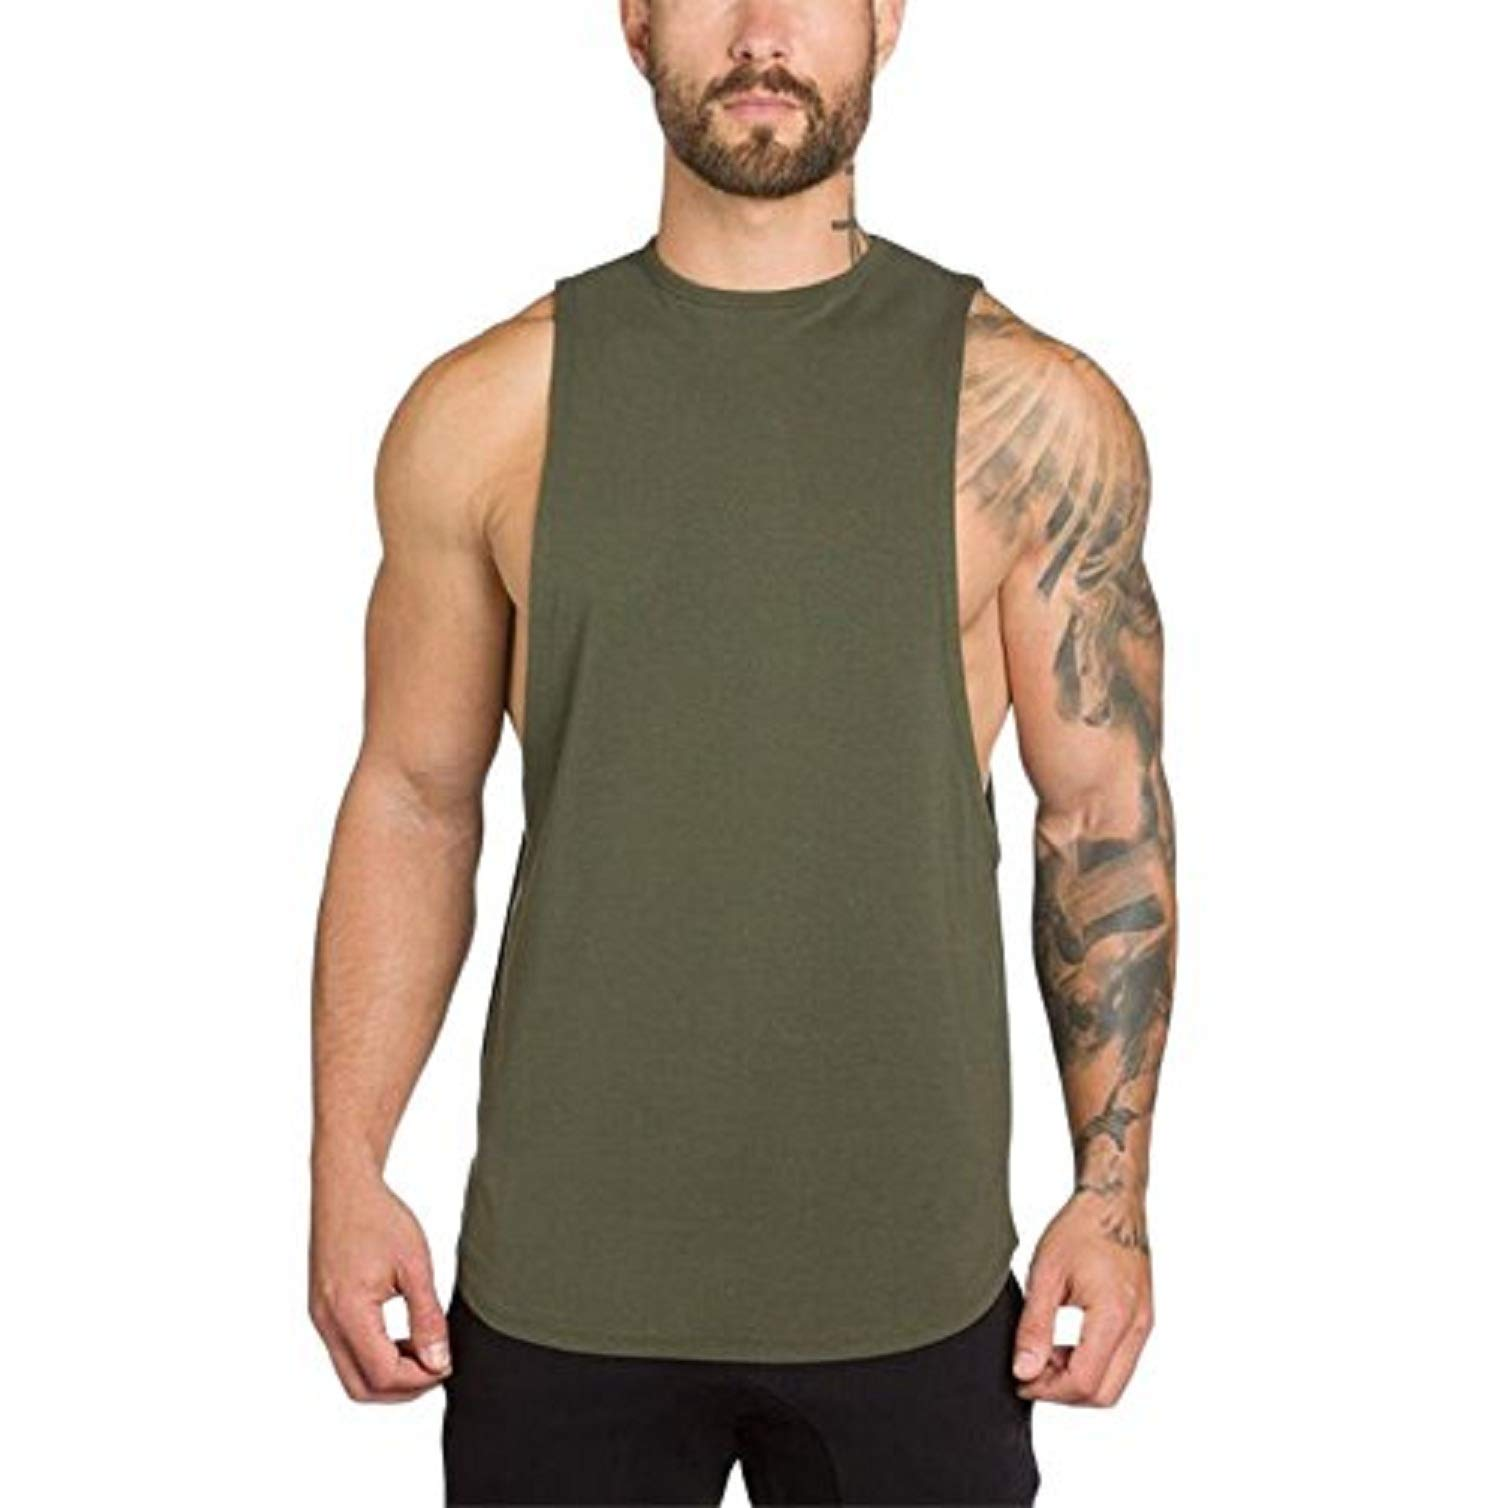 Men Tank Tops Workout,Men's Gyms Bodybuilding Fitness Muscle Sleeveless Singlet T-Shirt Top Vest Tank,Army Green,L